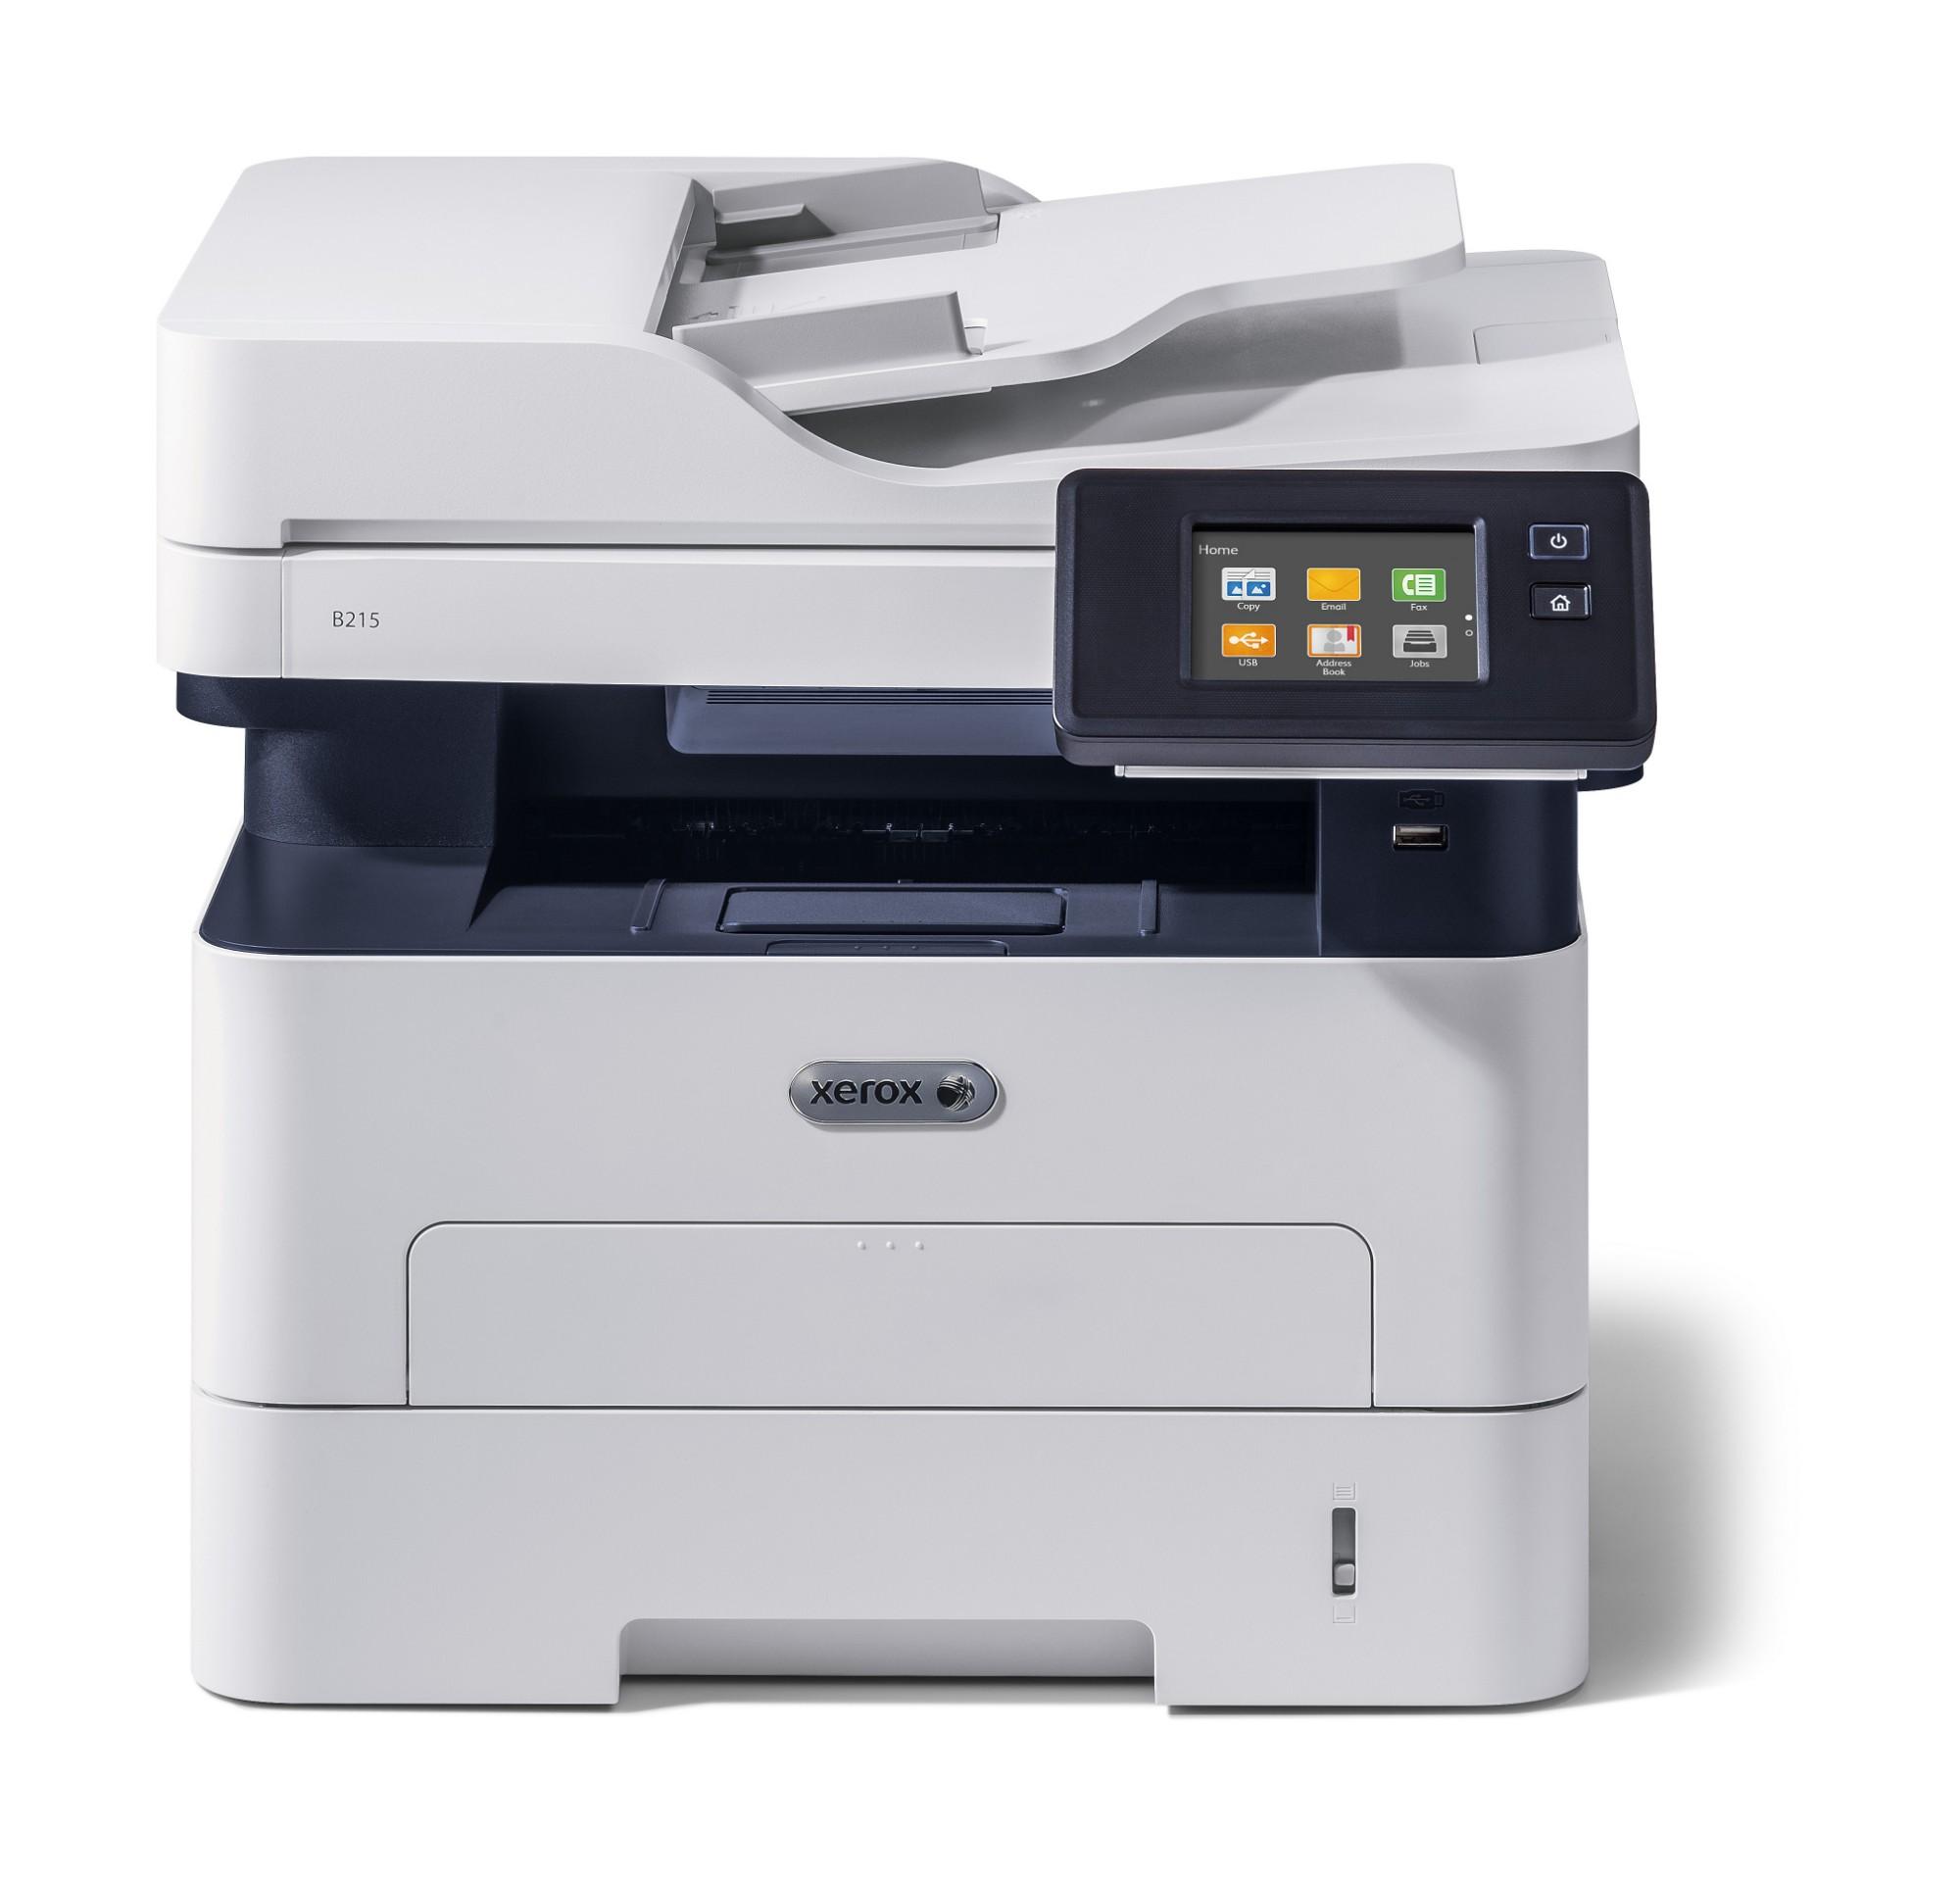 Xerox B215 A4 30Ppm Wireless Duplex Copy/Print/Scan/Fax Ps3 Pcl5E/6 Adf 2 Trays 251 Sheets